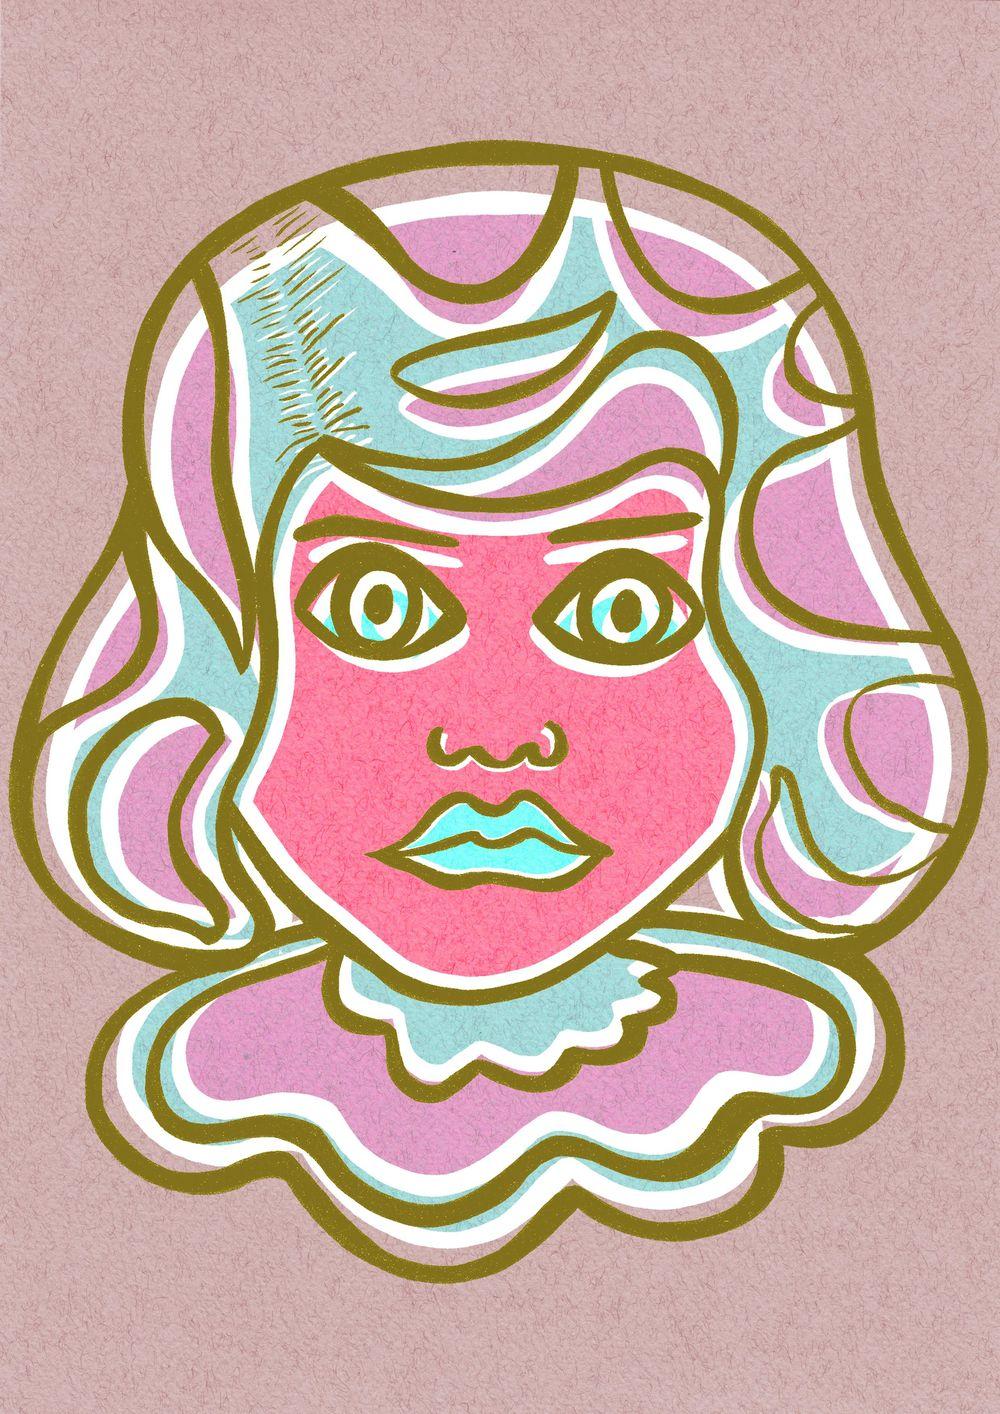 Pop art Girl - image 5 - student project